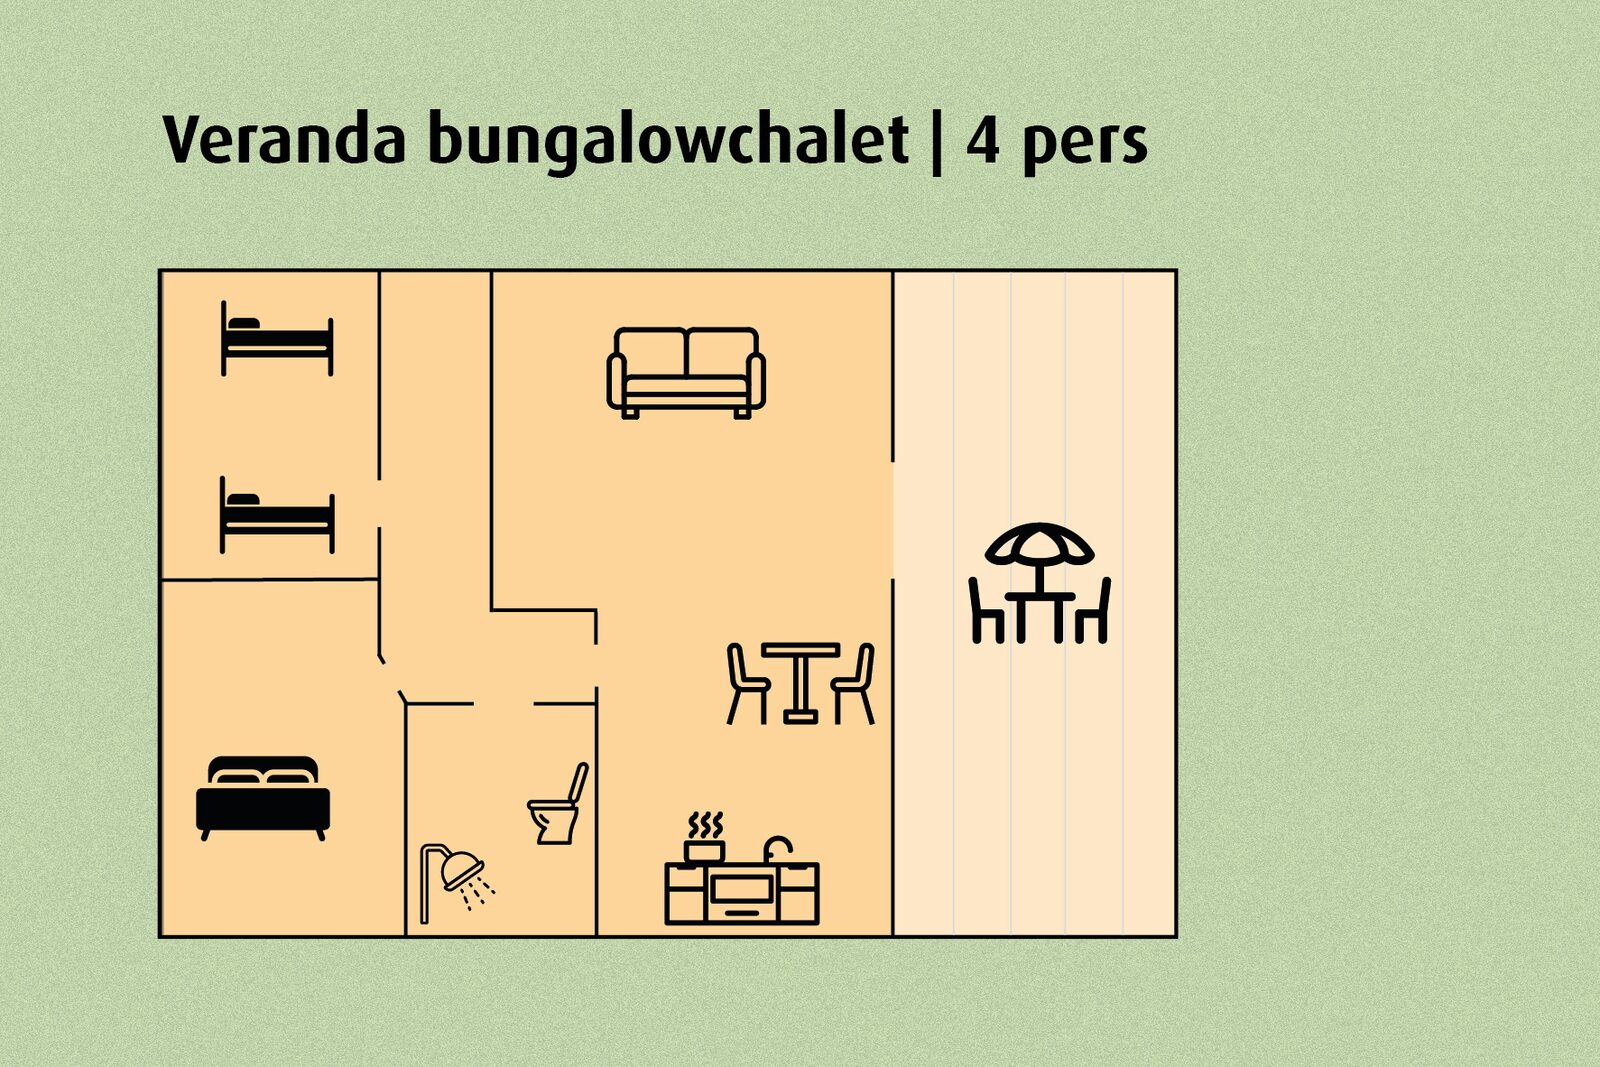 Patio Bungalow Chalet | 4 people